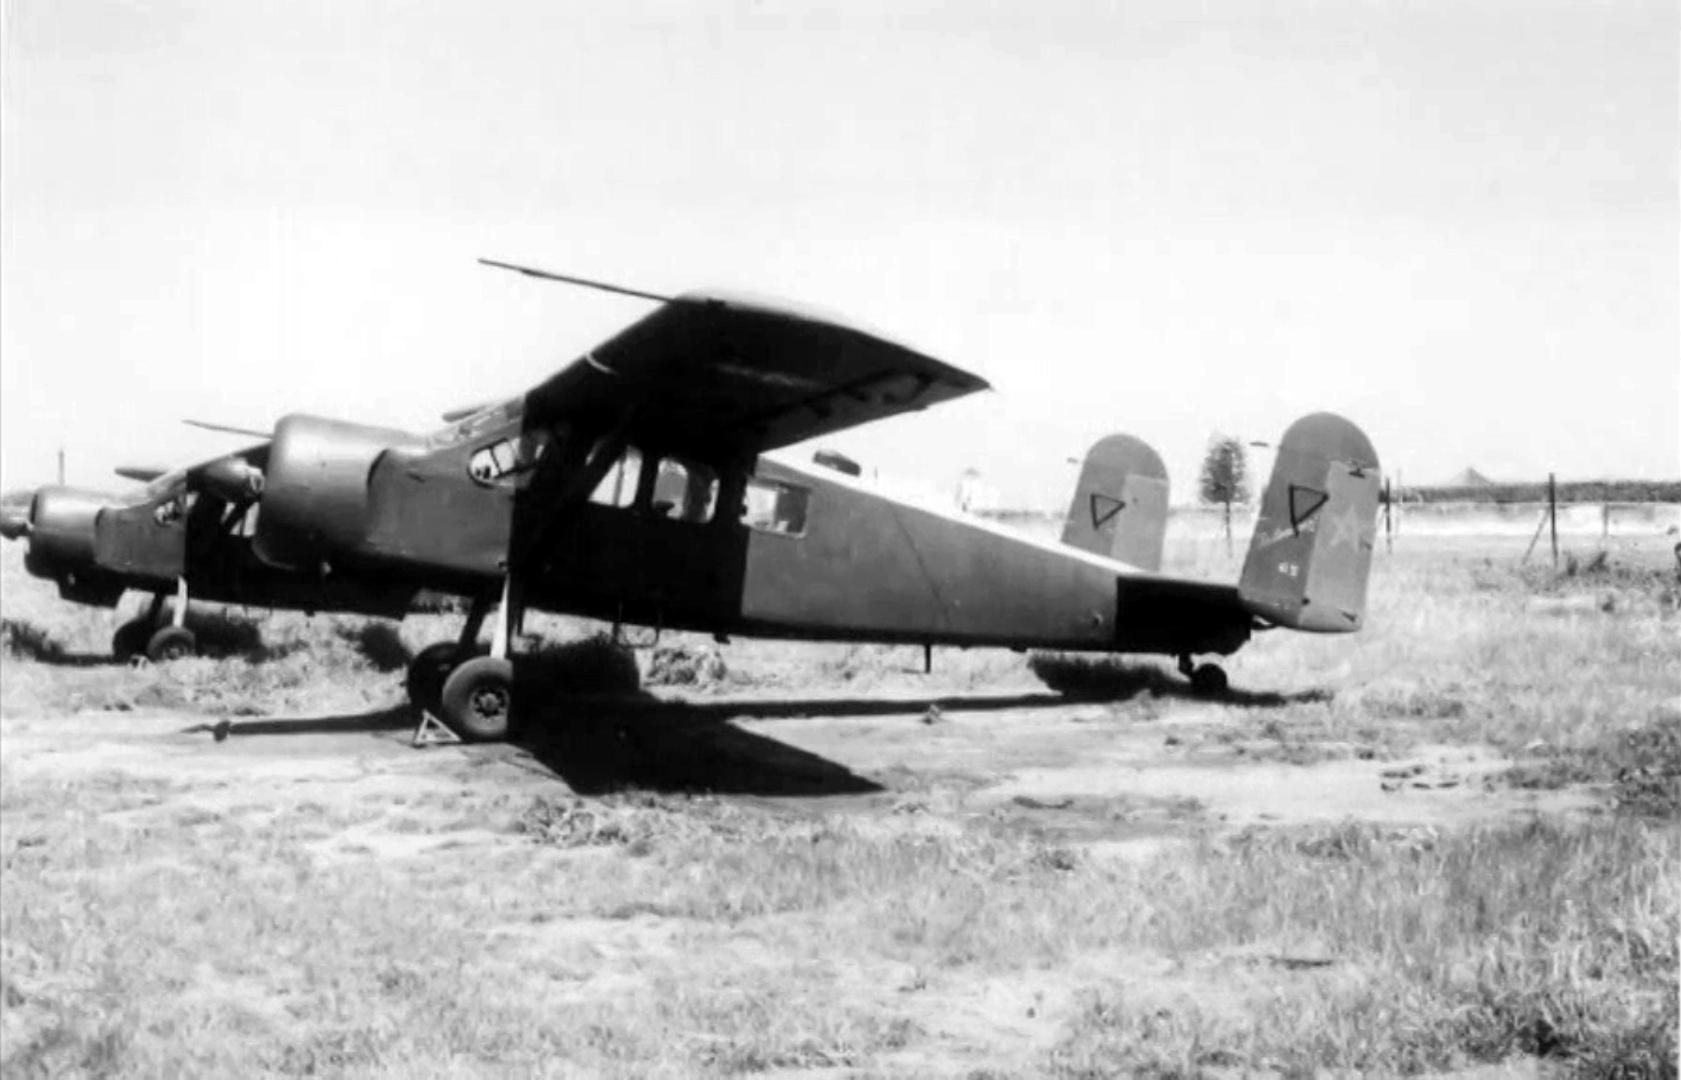 FRA: Photos anciens avions des FRA - Page 12 48129296302_9d84efaa2b_o